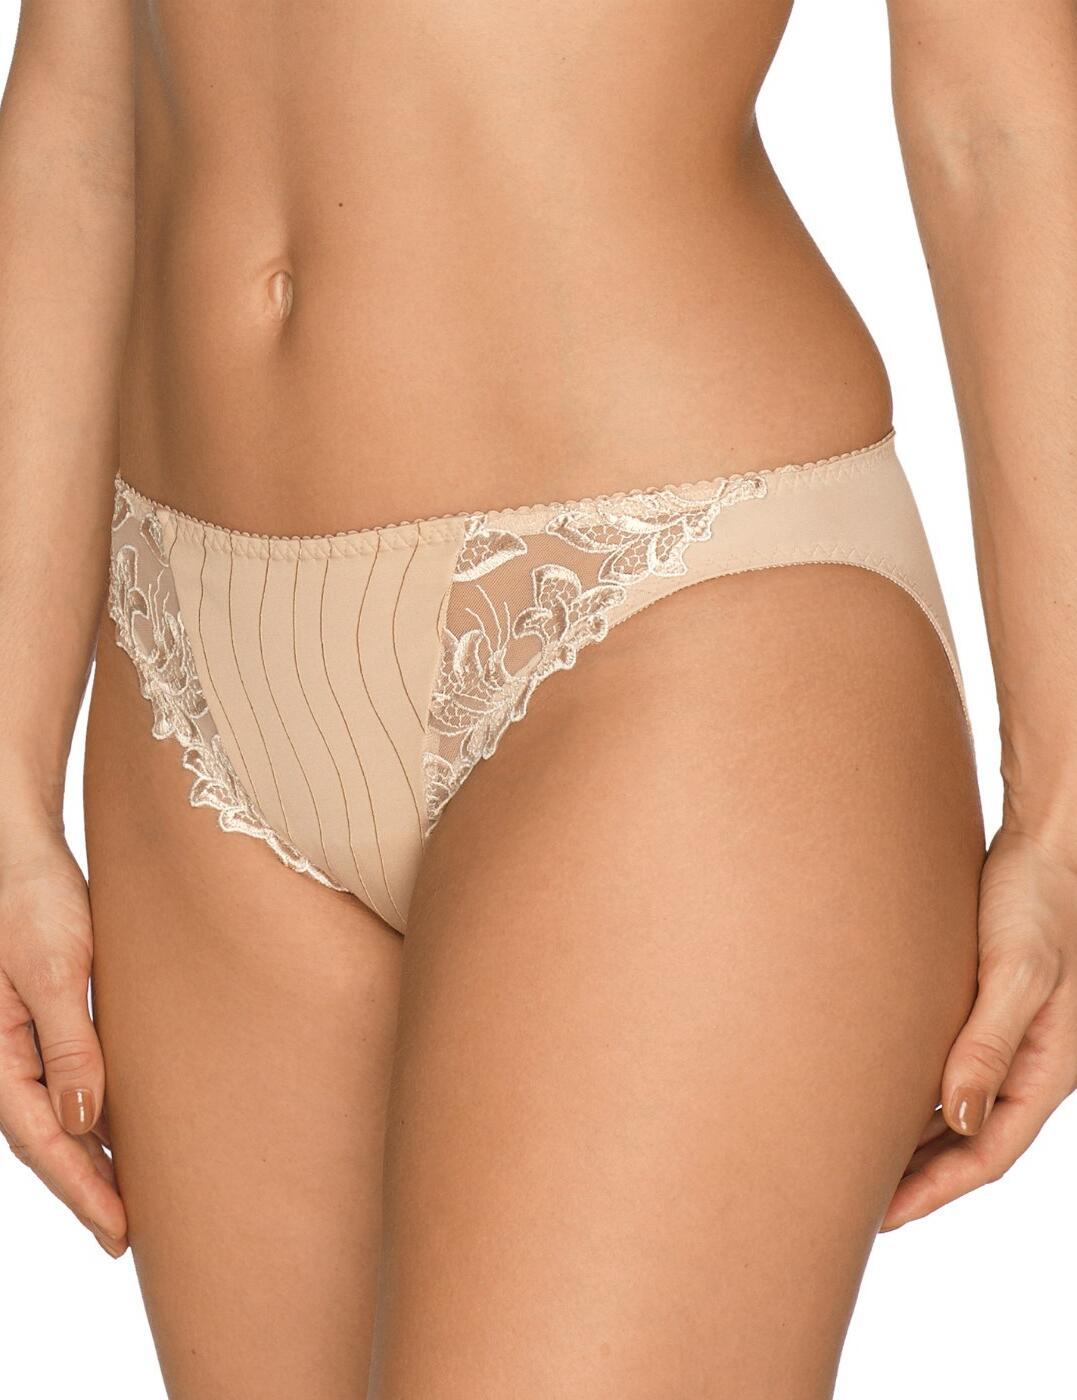 Prima-Donna-Deauville-Rio-Slips-Culotte-0561810-Neuf-Luxe-Femme-Lingerie miniature 7